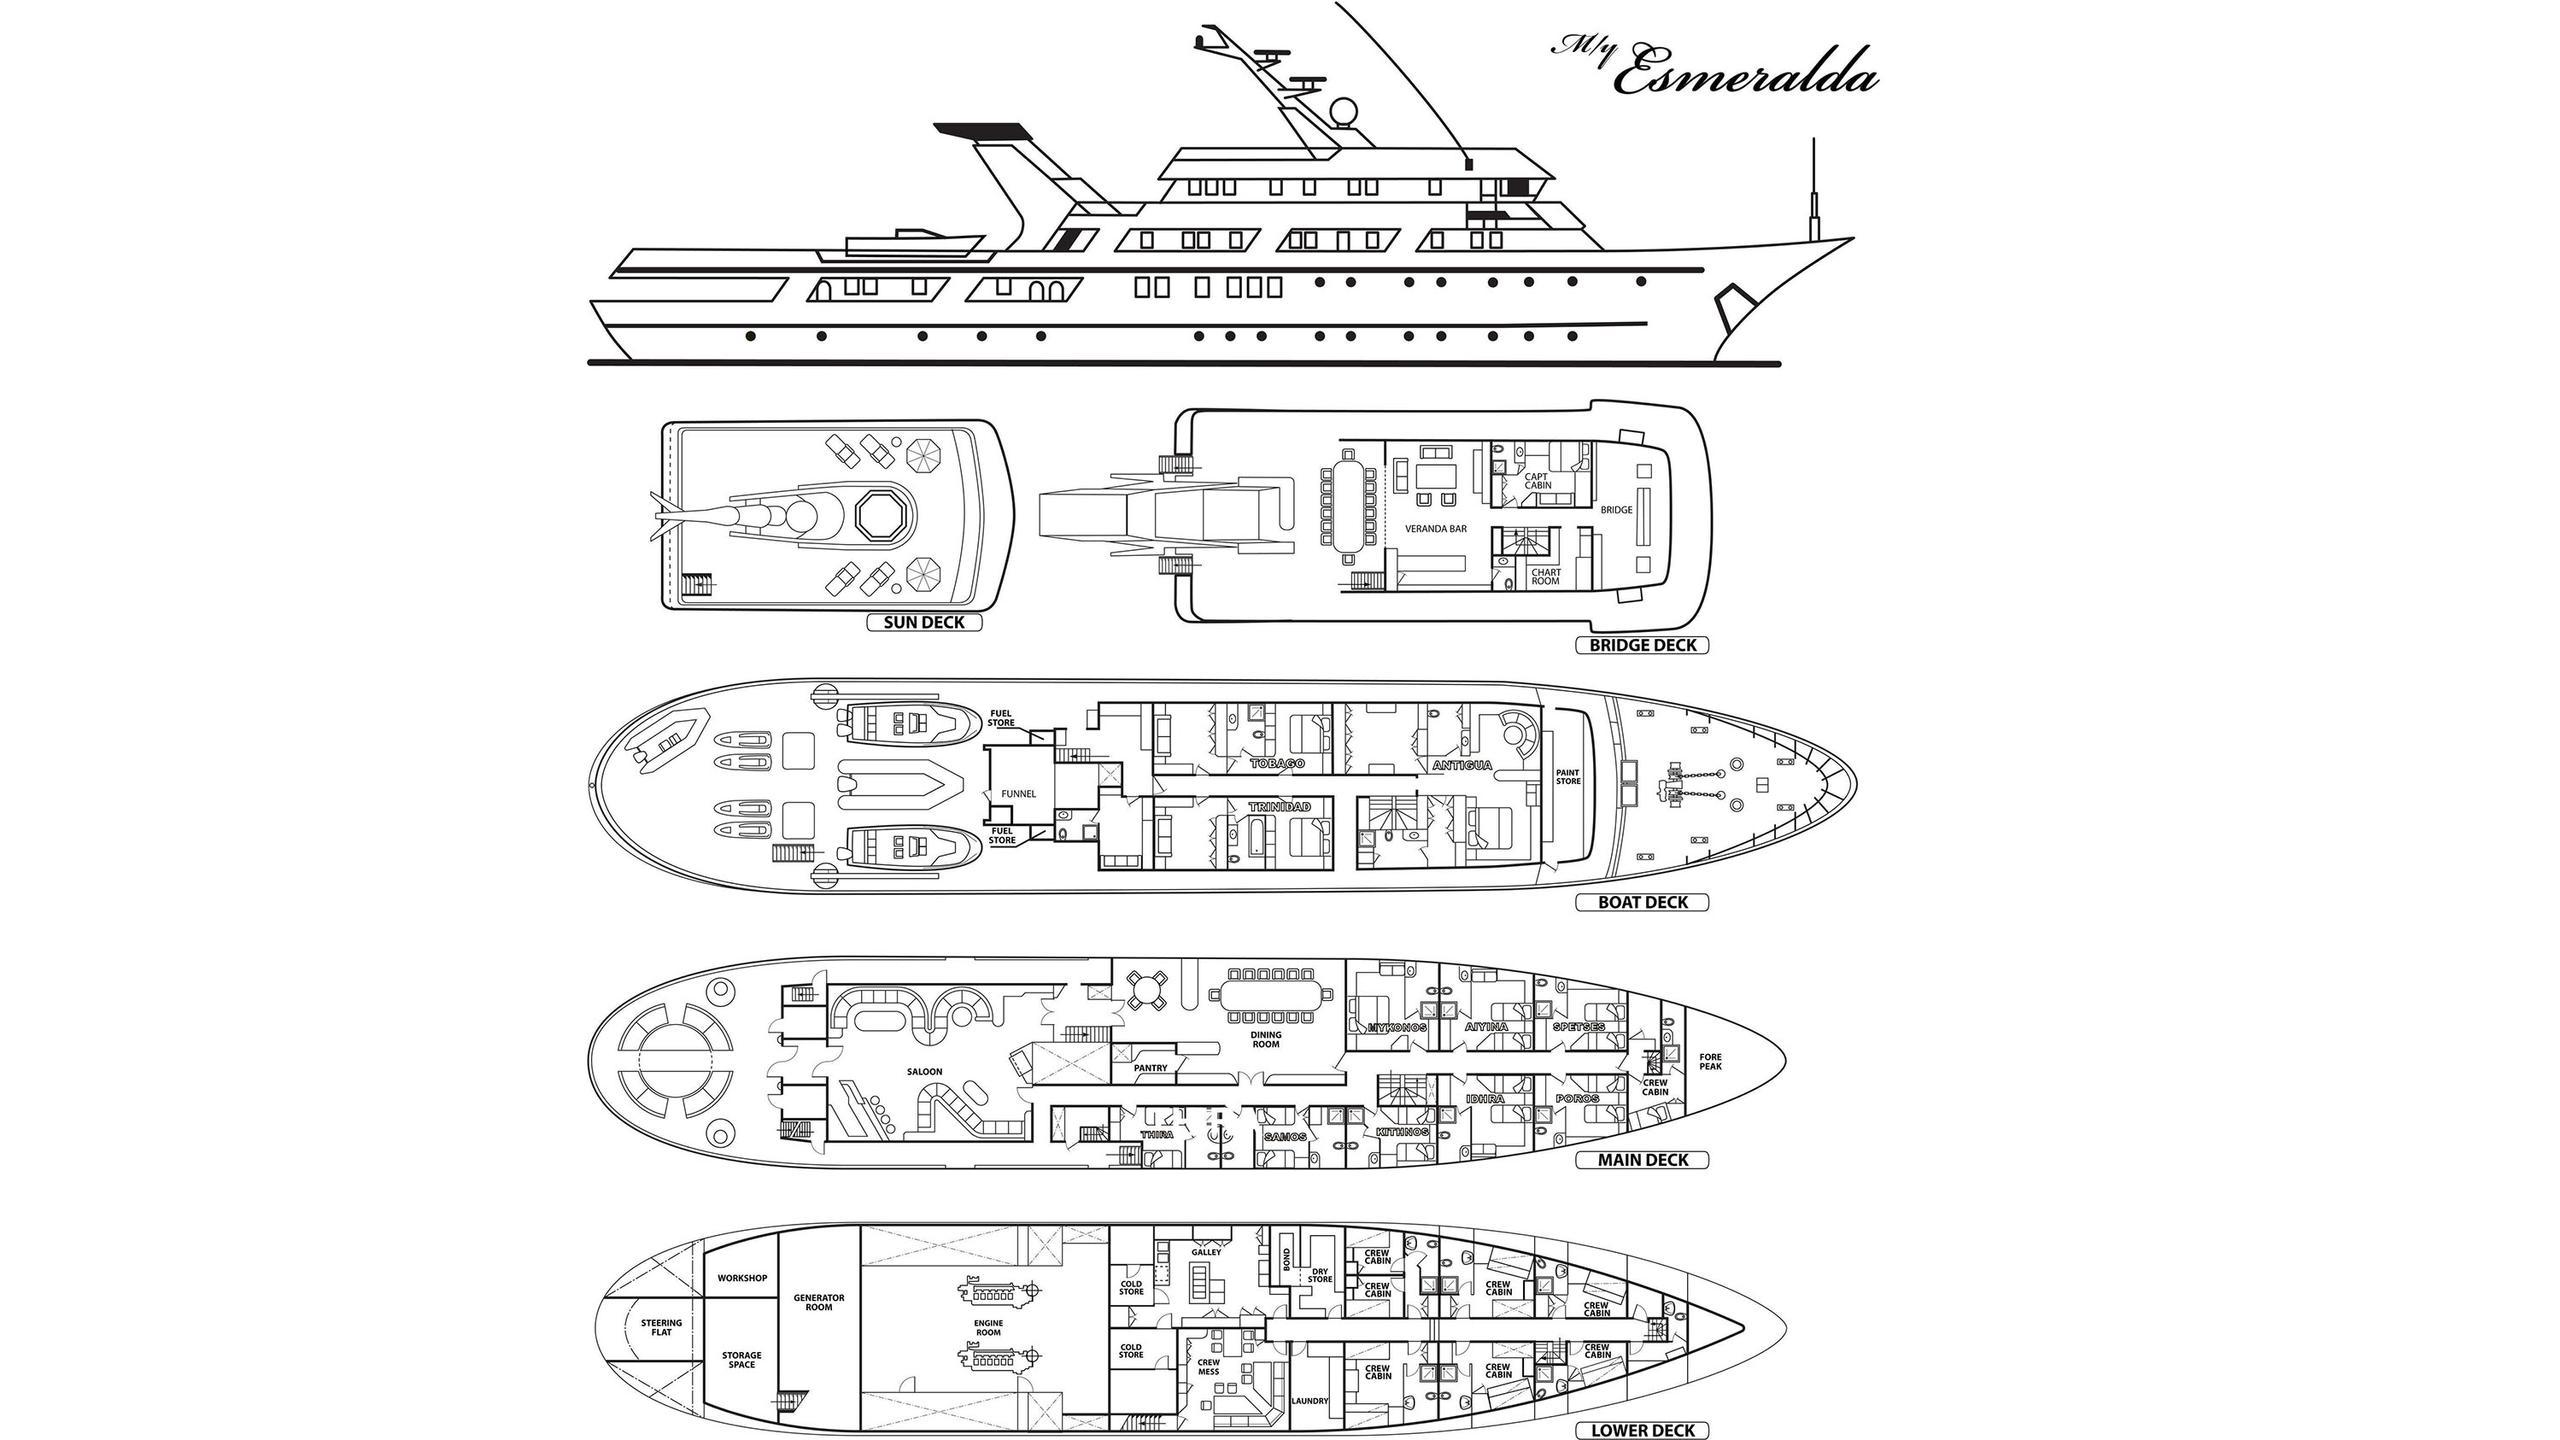 Esmeralda-motor-yacht-for-charter-deckplan